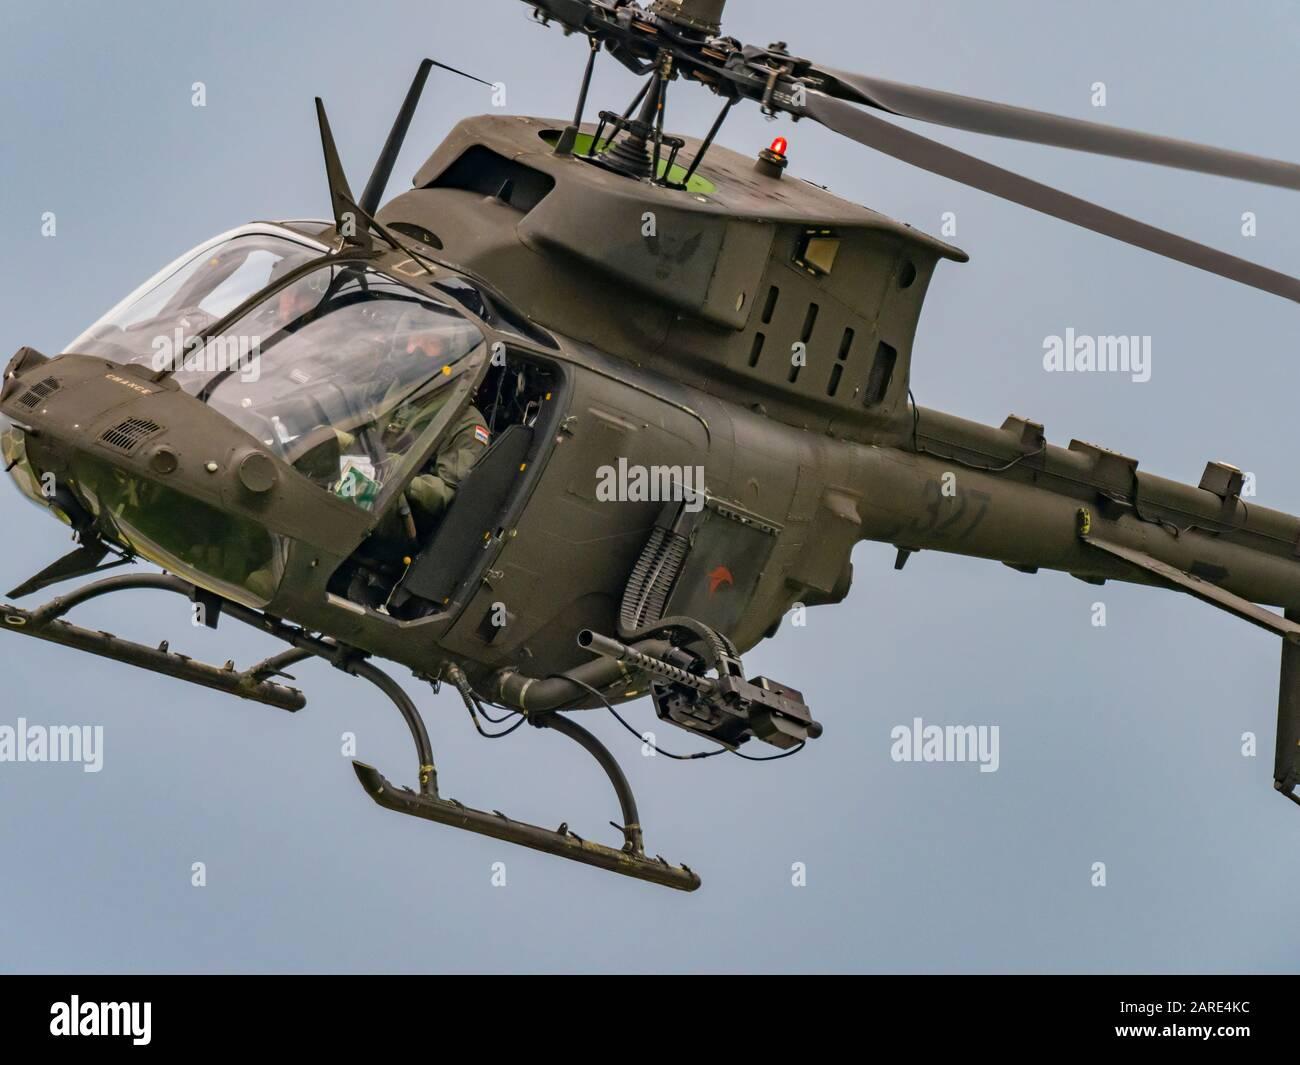 Kiowa Warrior OH-58D reg number 327 helicopter OH58D Croatian Air Force 393 Eskadrila helikoptera 93 krila HRZ fatal accident near Zlarin 27.01.2020 Stock Photo